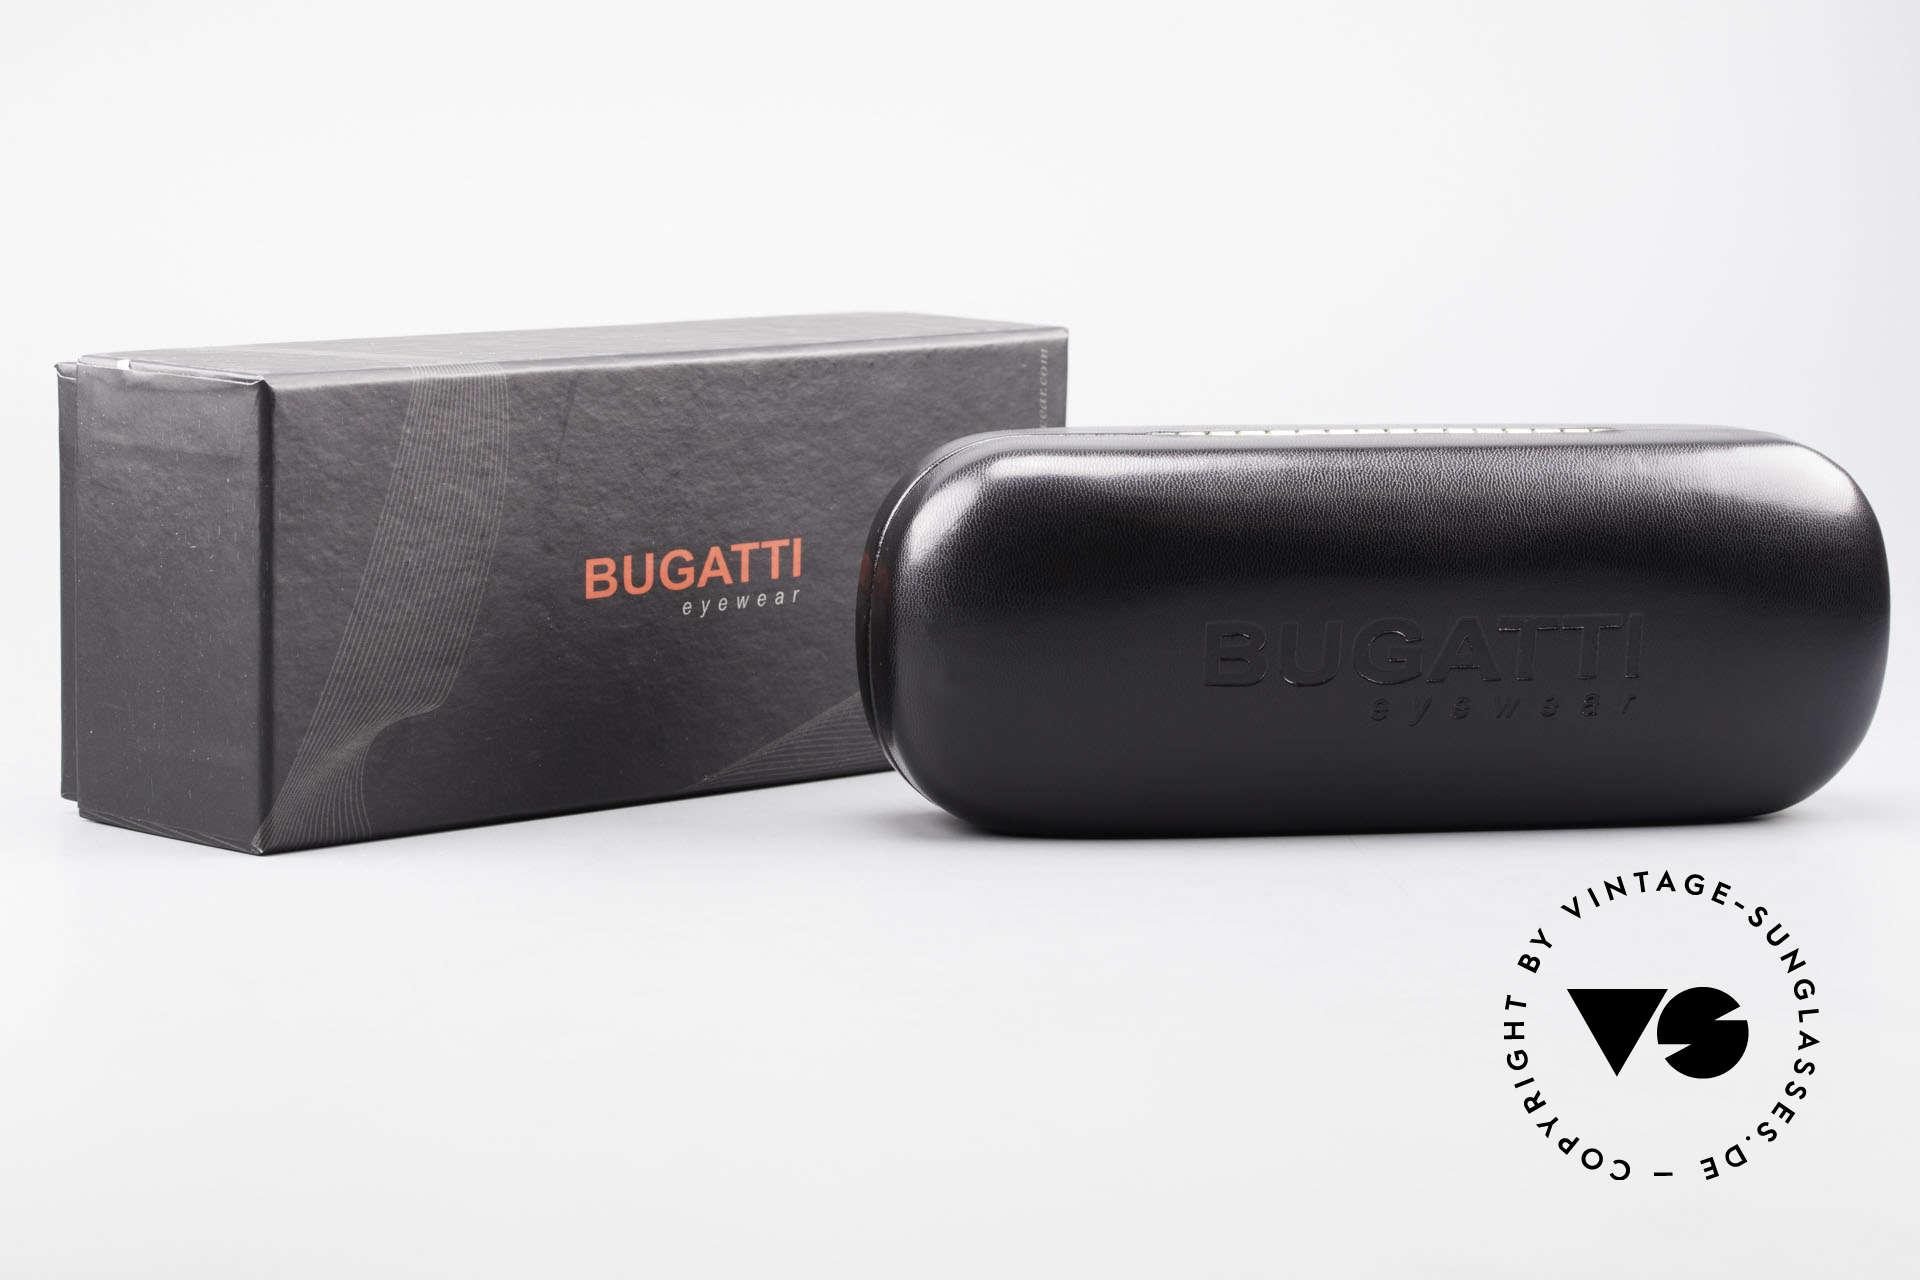 Bugatti 222 Extraordinary Vintage Glasses, Size: medium, Made for Men